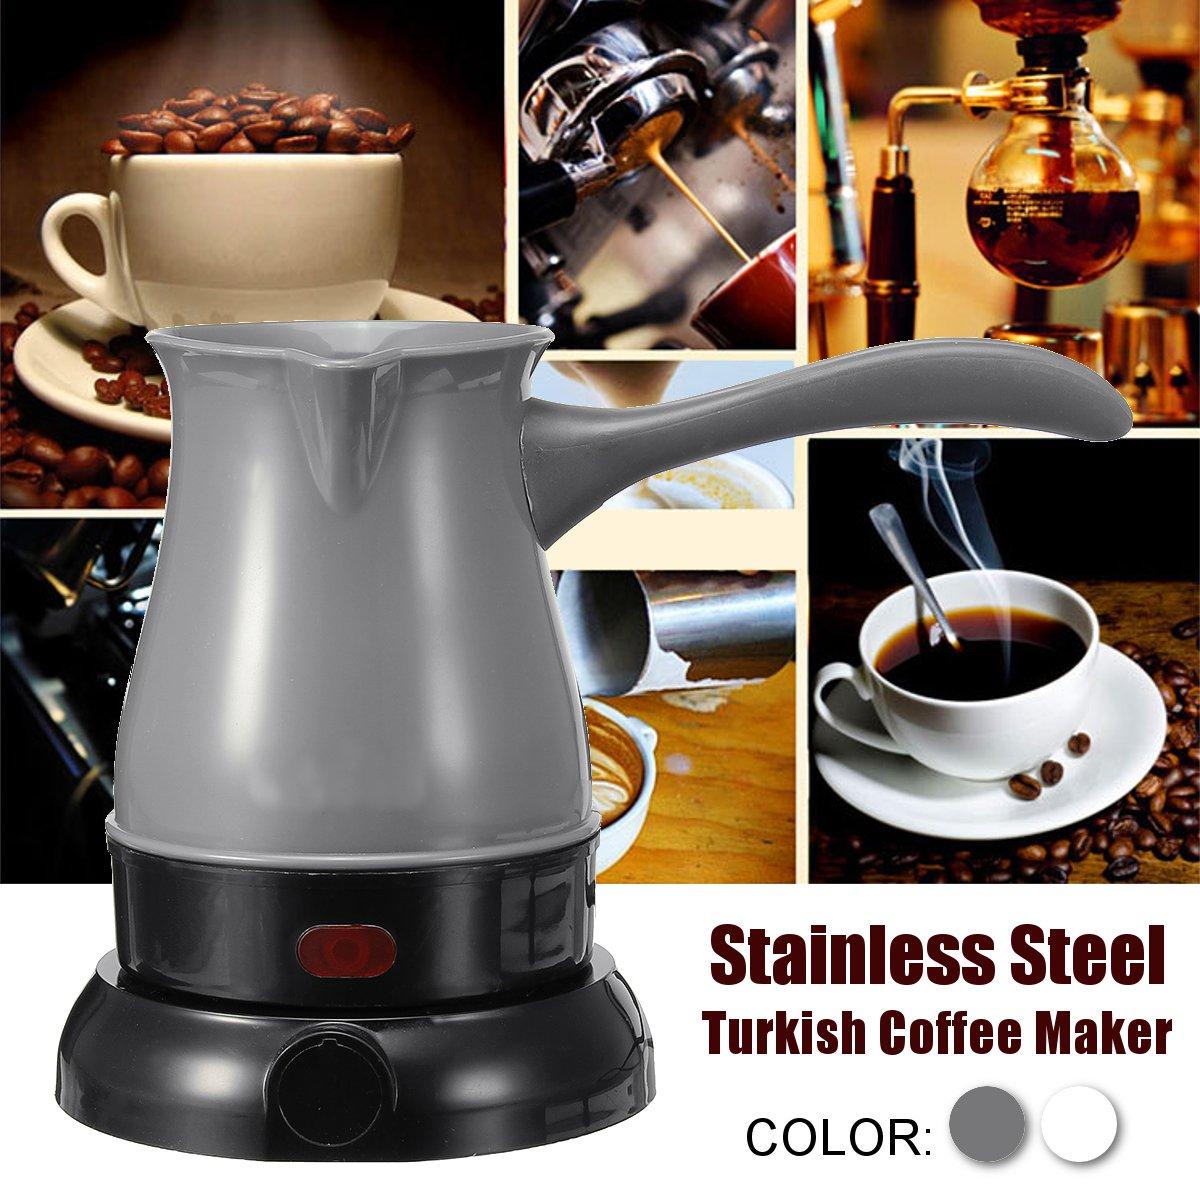 600W 220V Electric Turkish Coffee Maker 300ml Stainless Steel Tea Milk Pot Portable Coffee Machine Boiled Milk Coffee Kettle